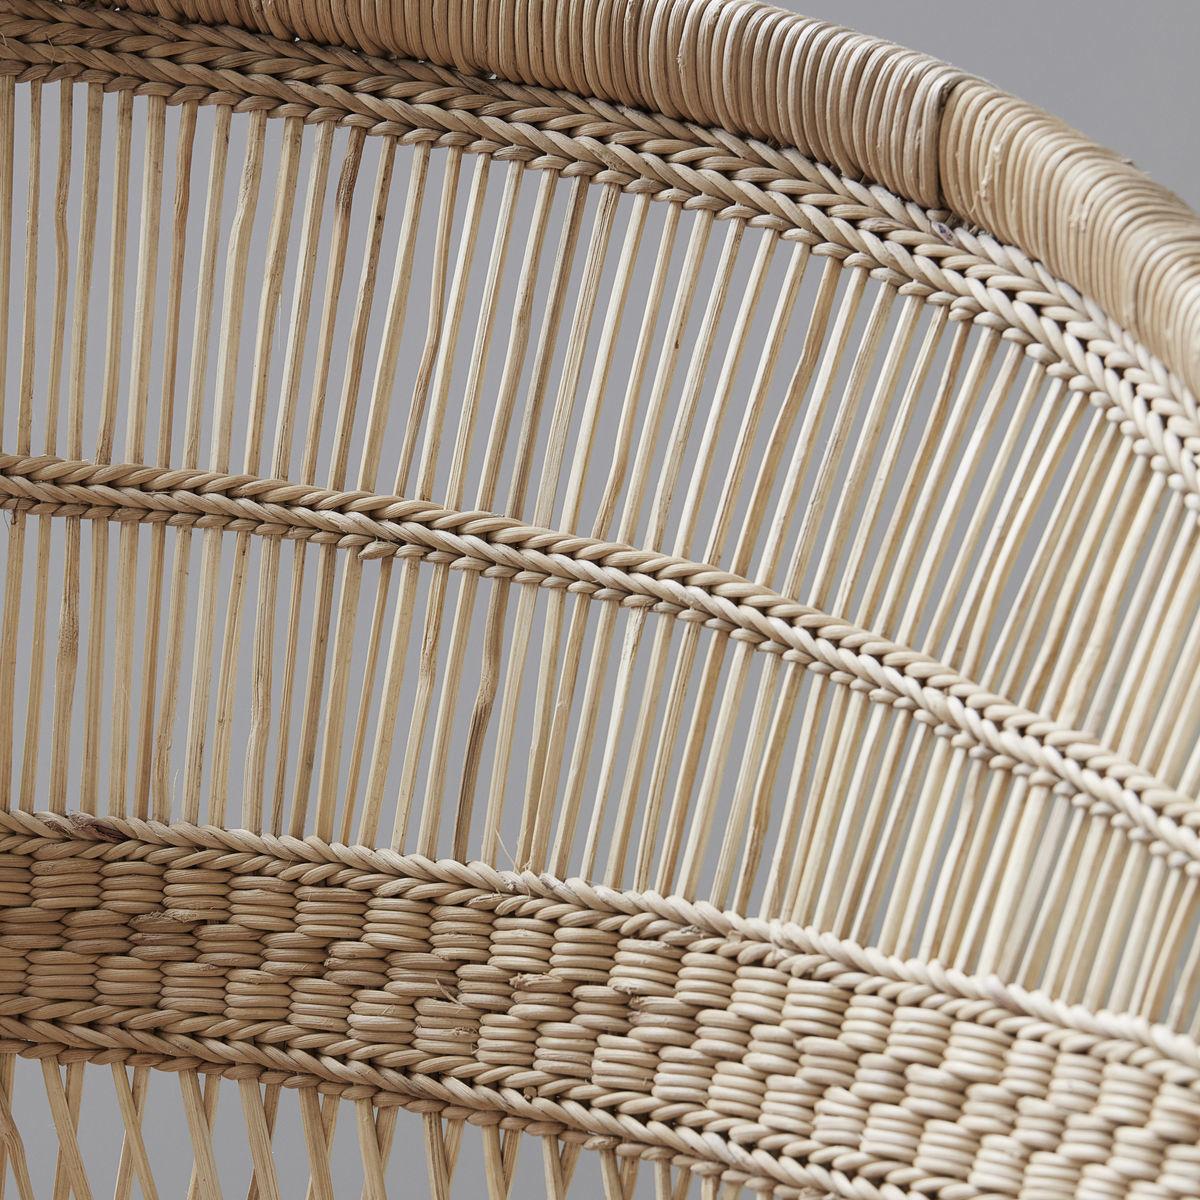 Petite Lily Interiors Malawi chair Boho-Chic - 45xw78xh78cm - naturel